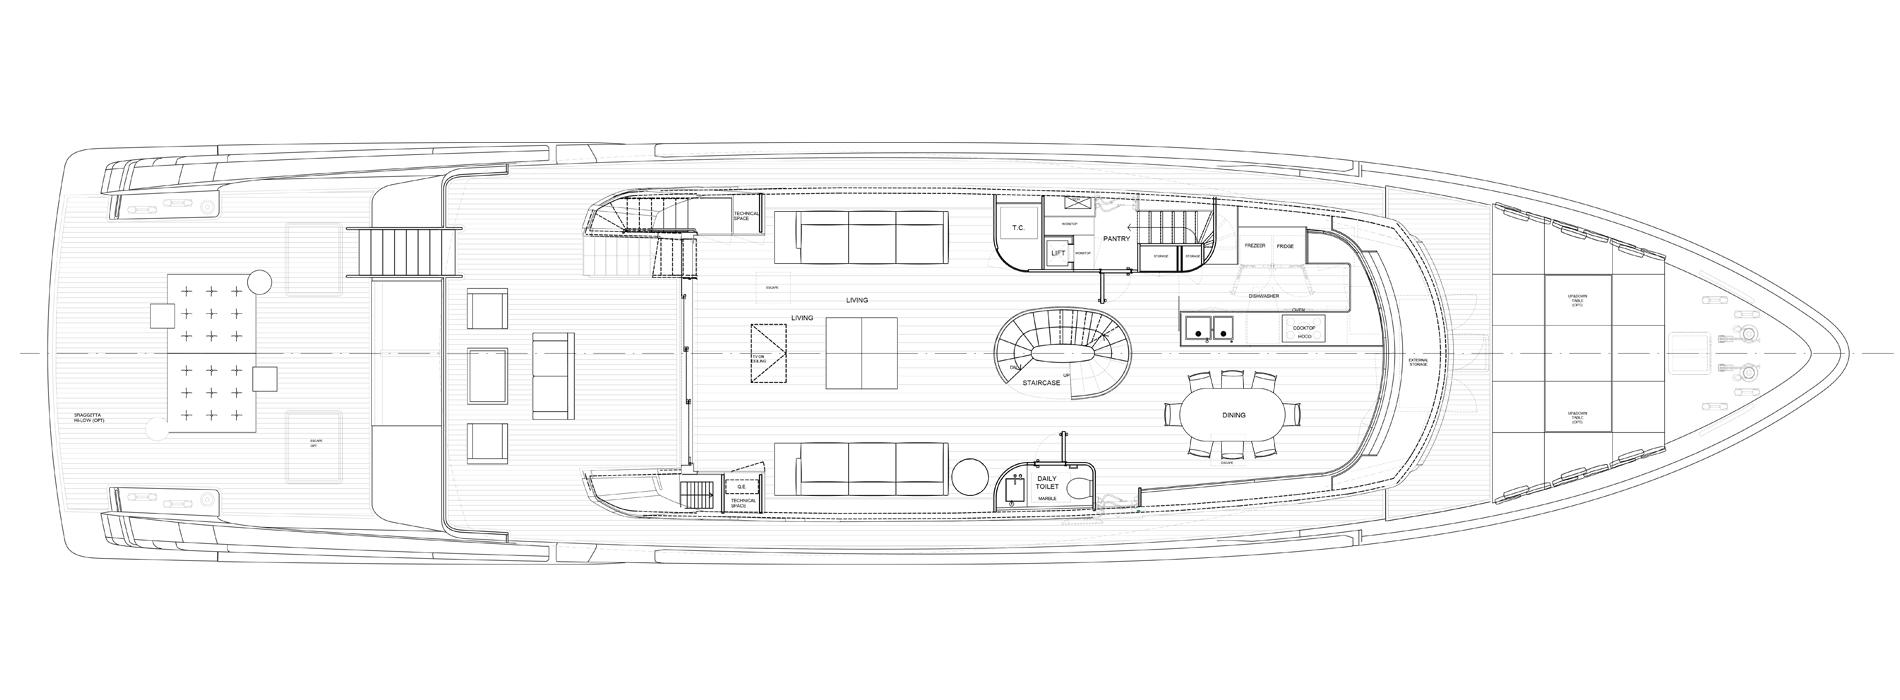 Sanlorenzo Yachts SX112 Главная палуба  версия B